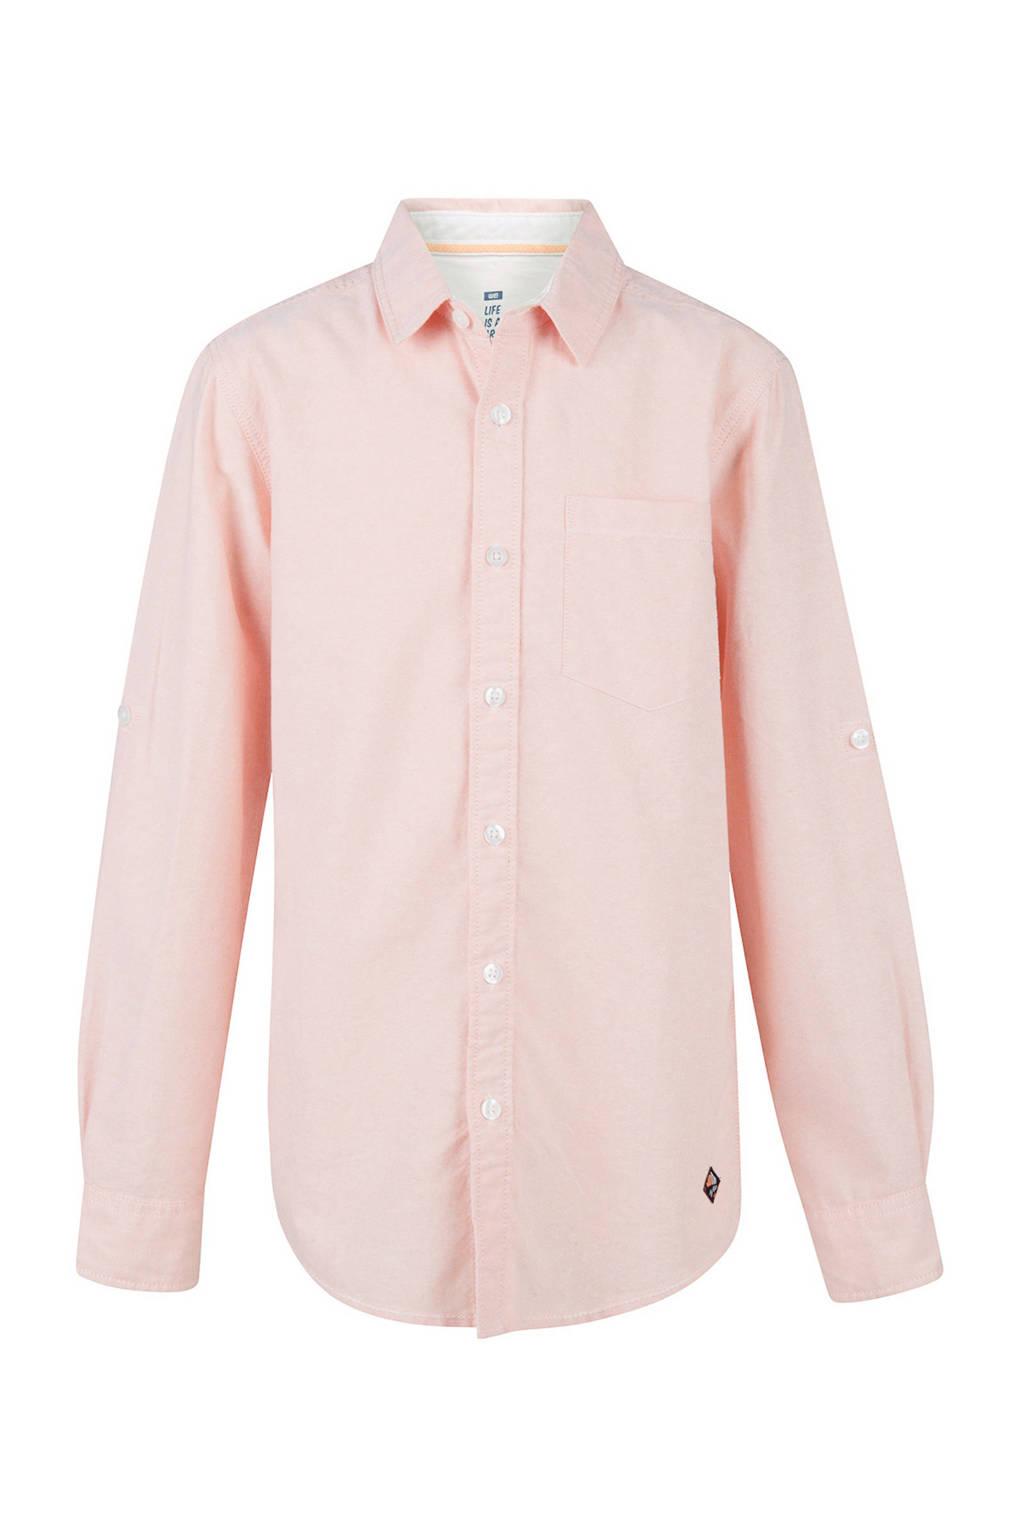 WE Fashion overhemd zalm, Zalm